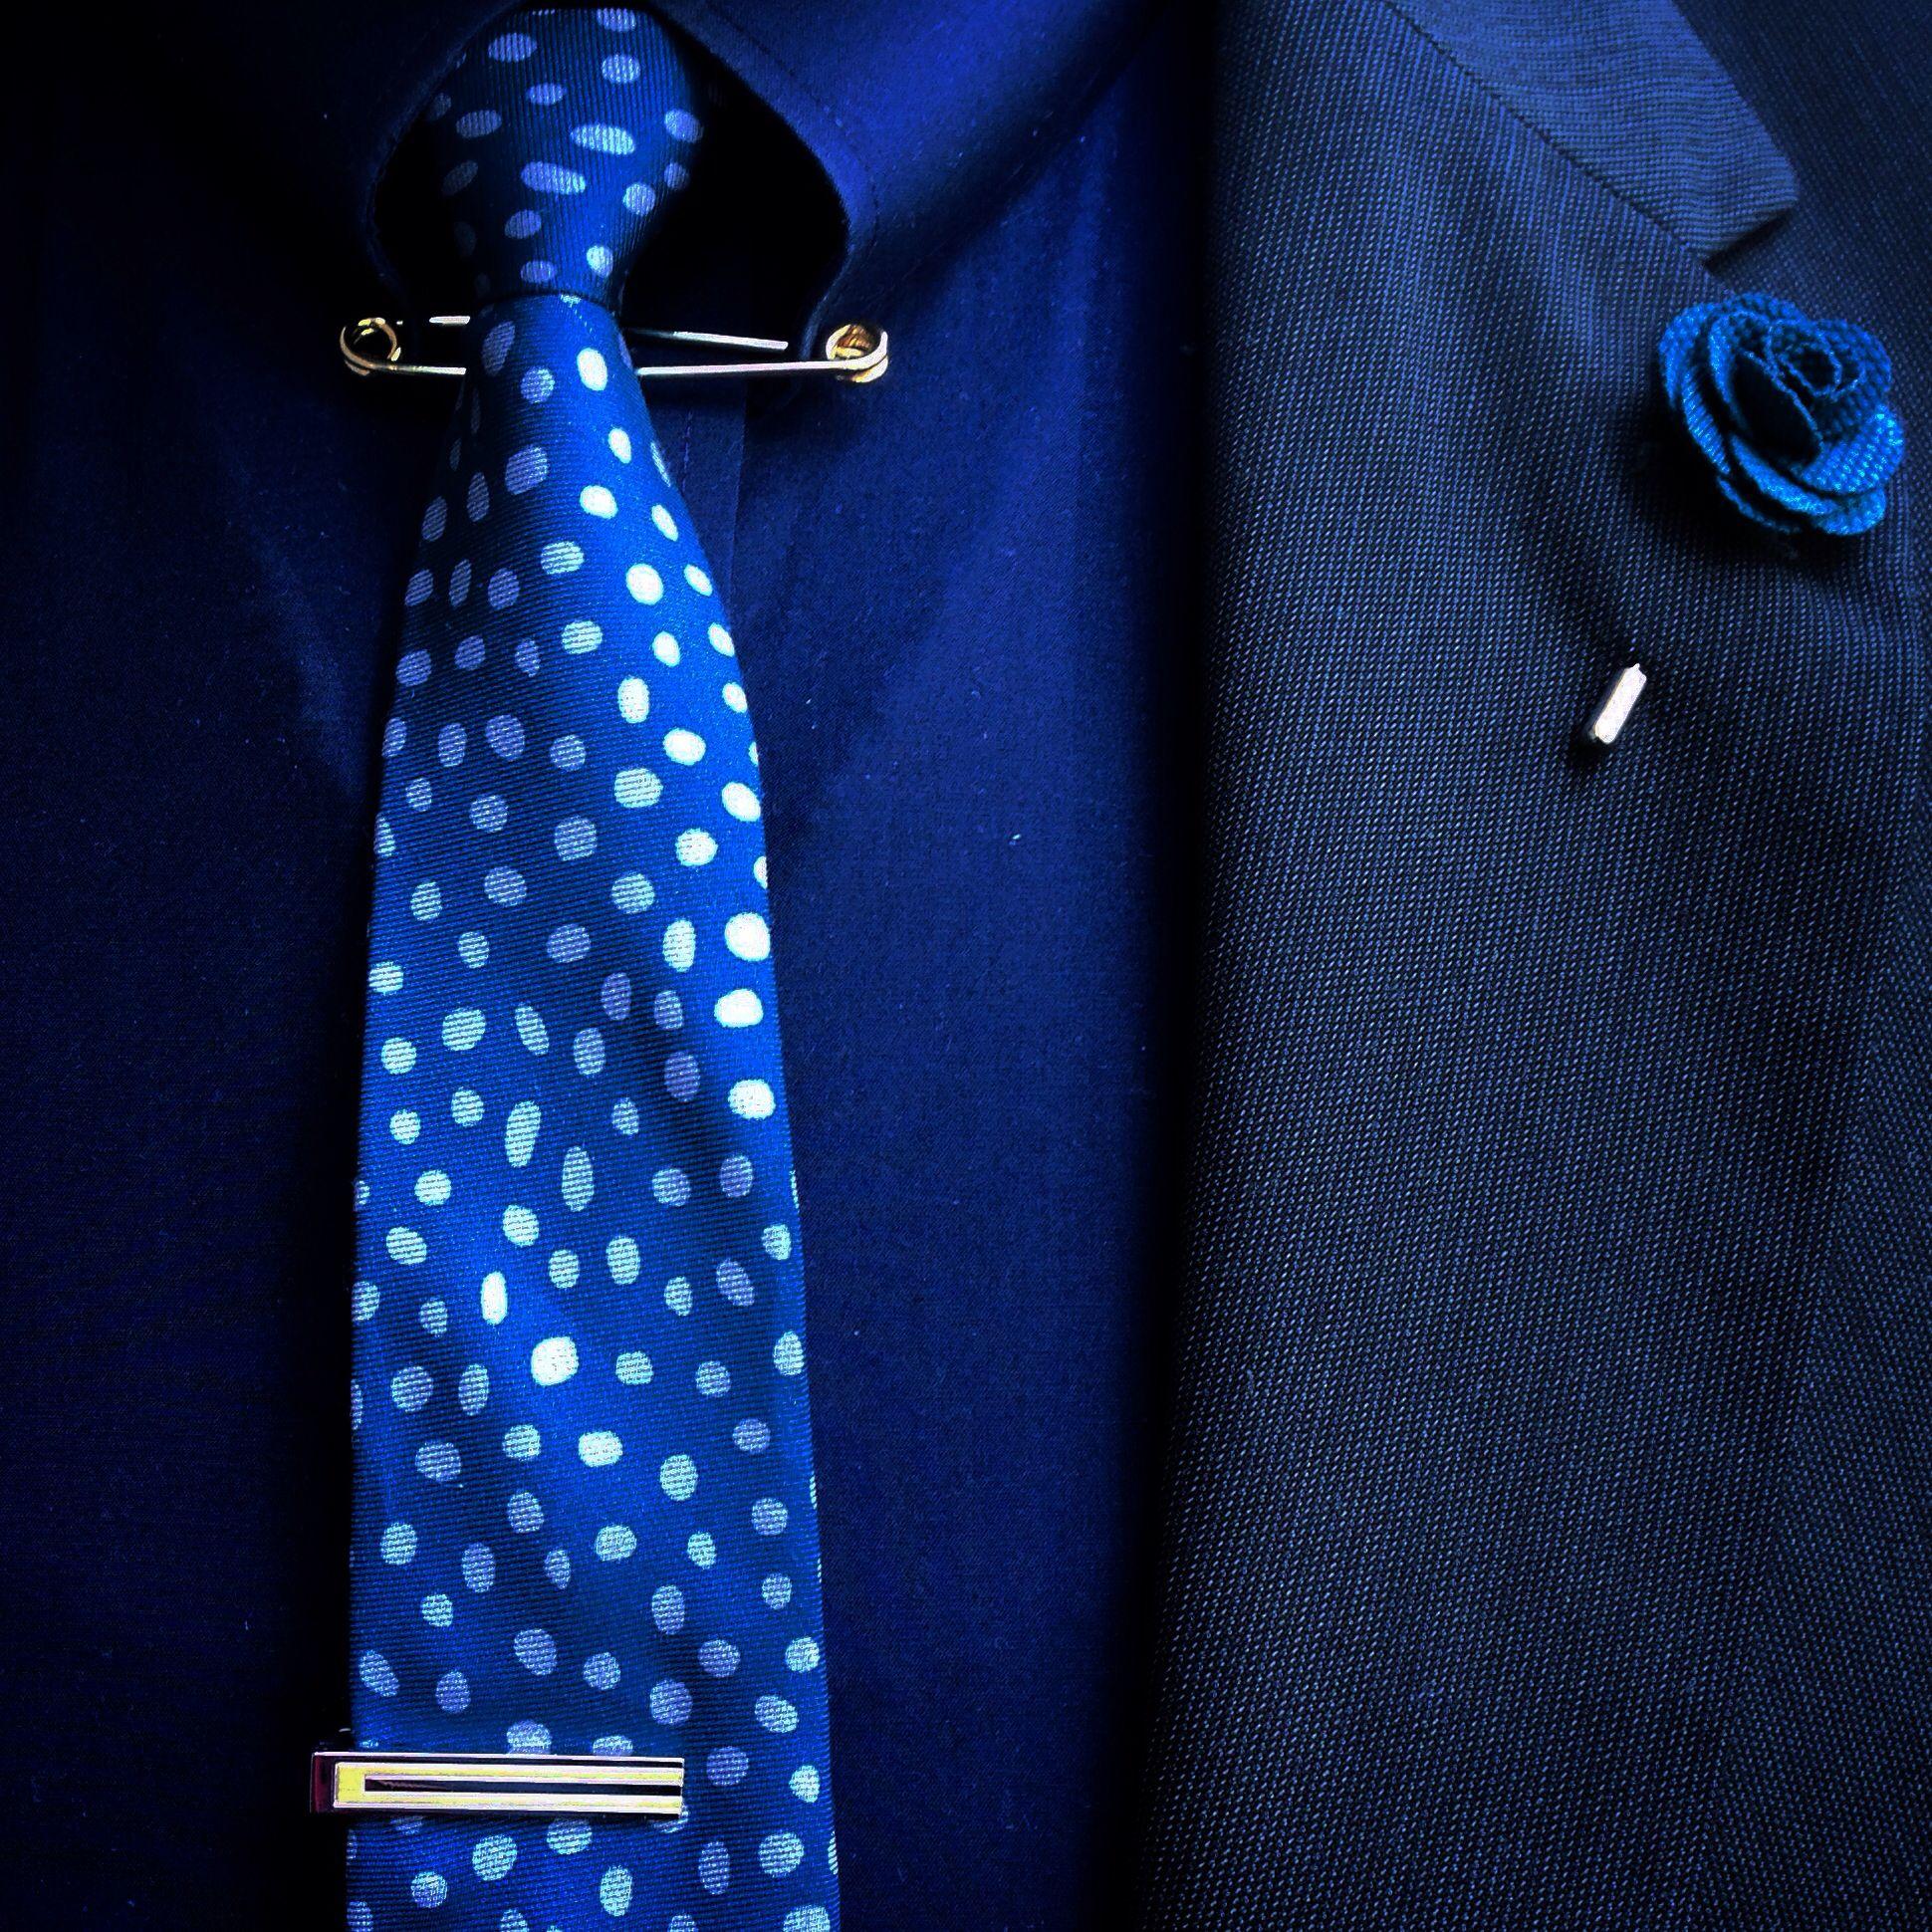 Canda suit, club monaco tie, the tie bar collar bar and tie bar, river island flower lapel, stafford shirt.